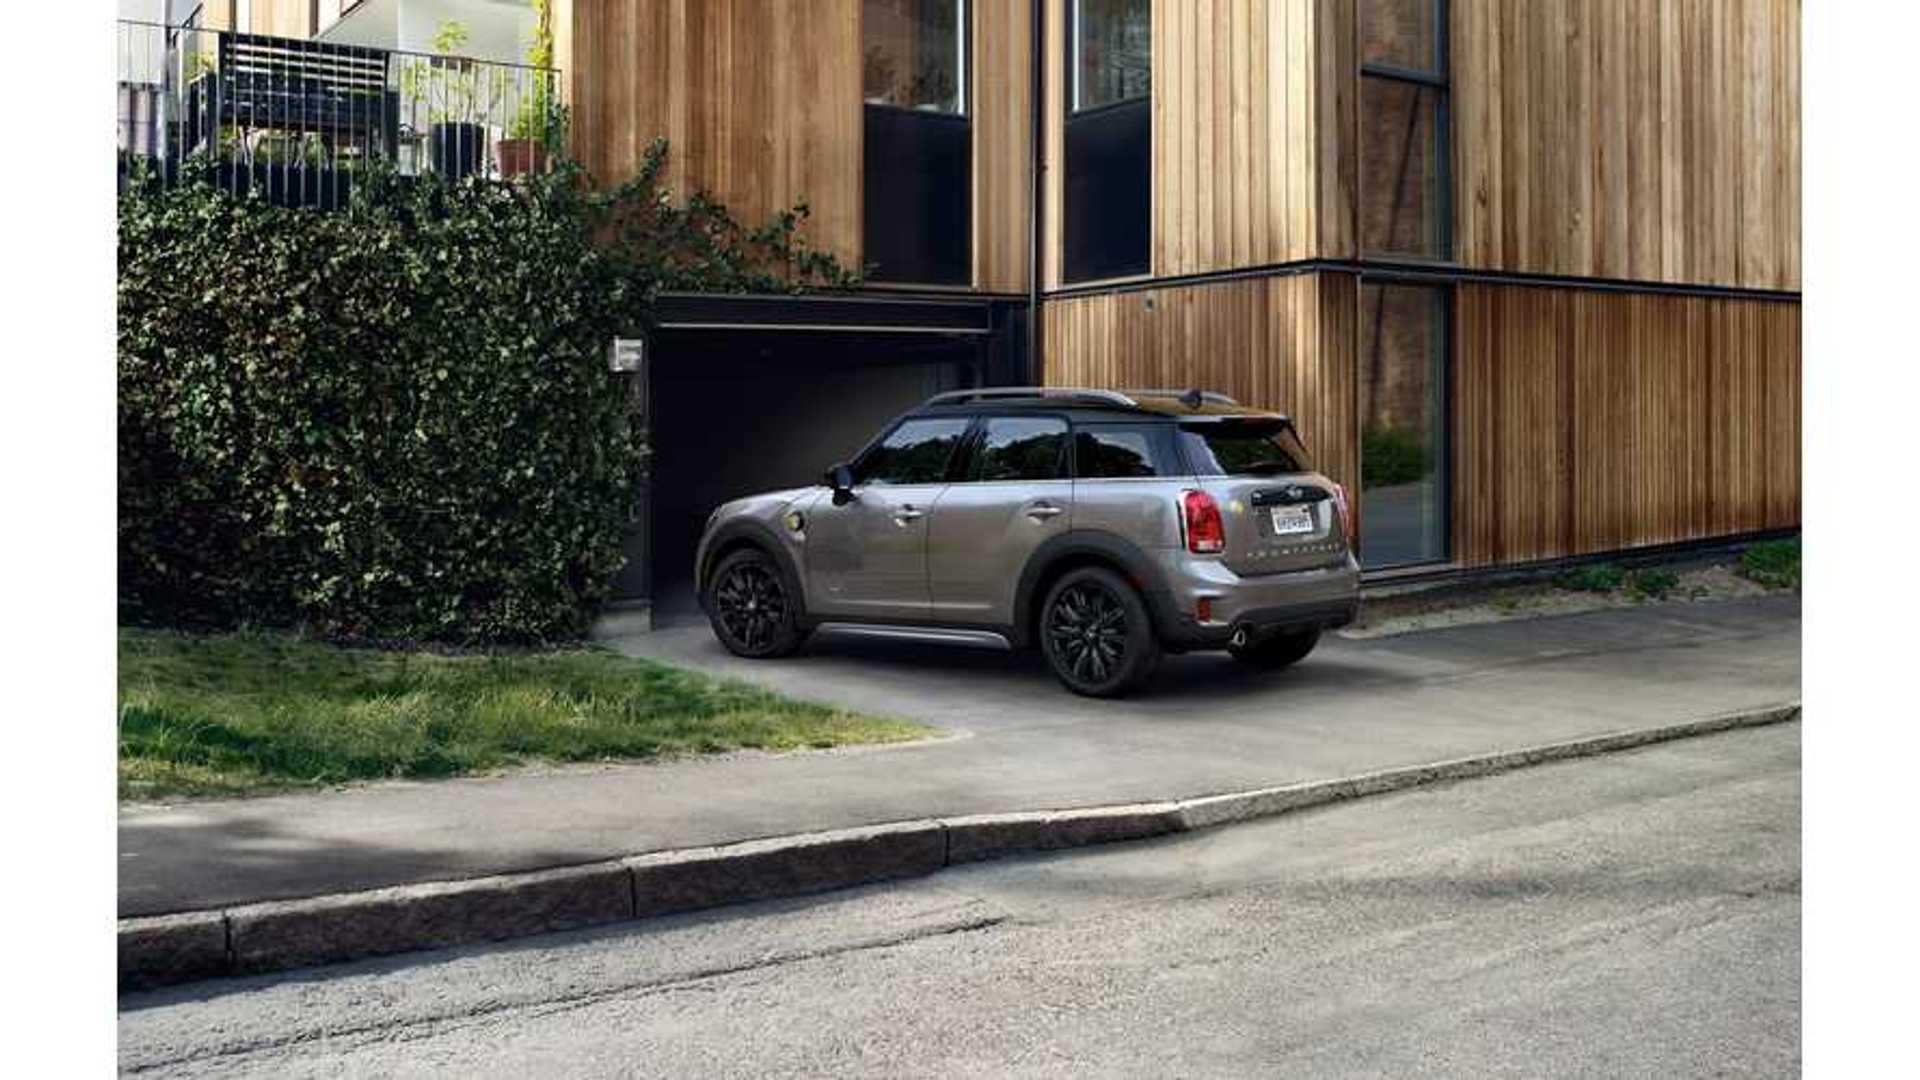 Mini Cooper S E Countryman All4 Plug In Hybrid Tested Video